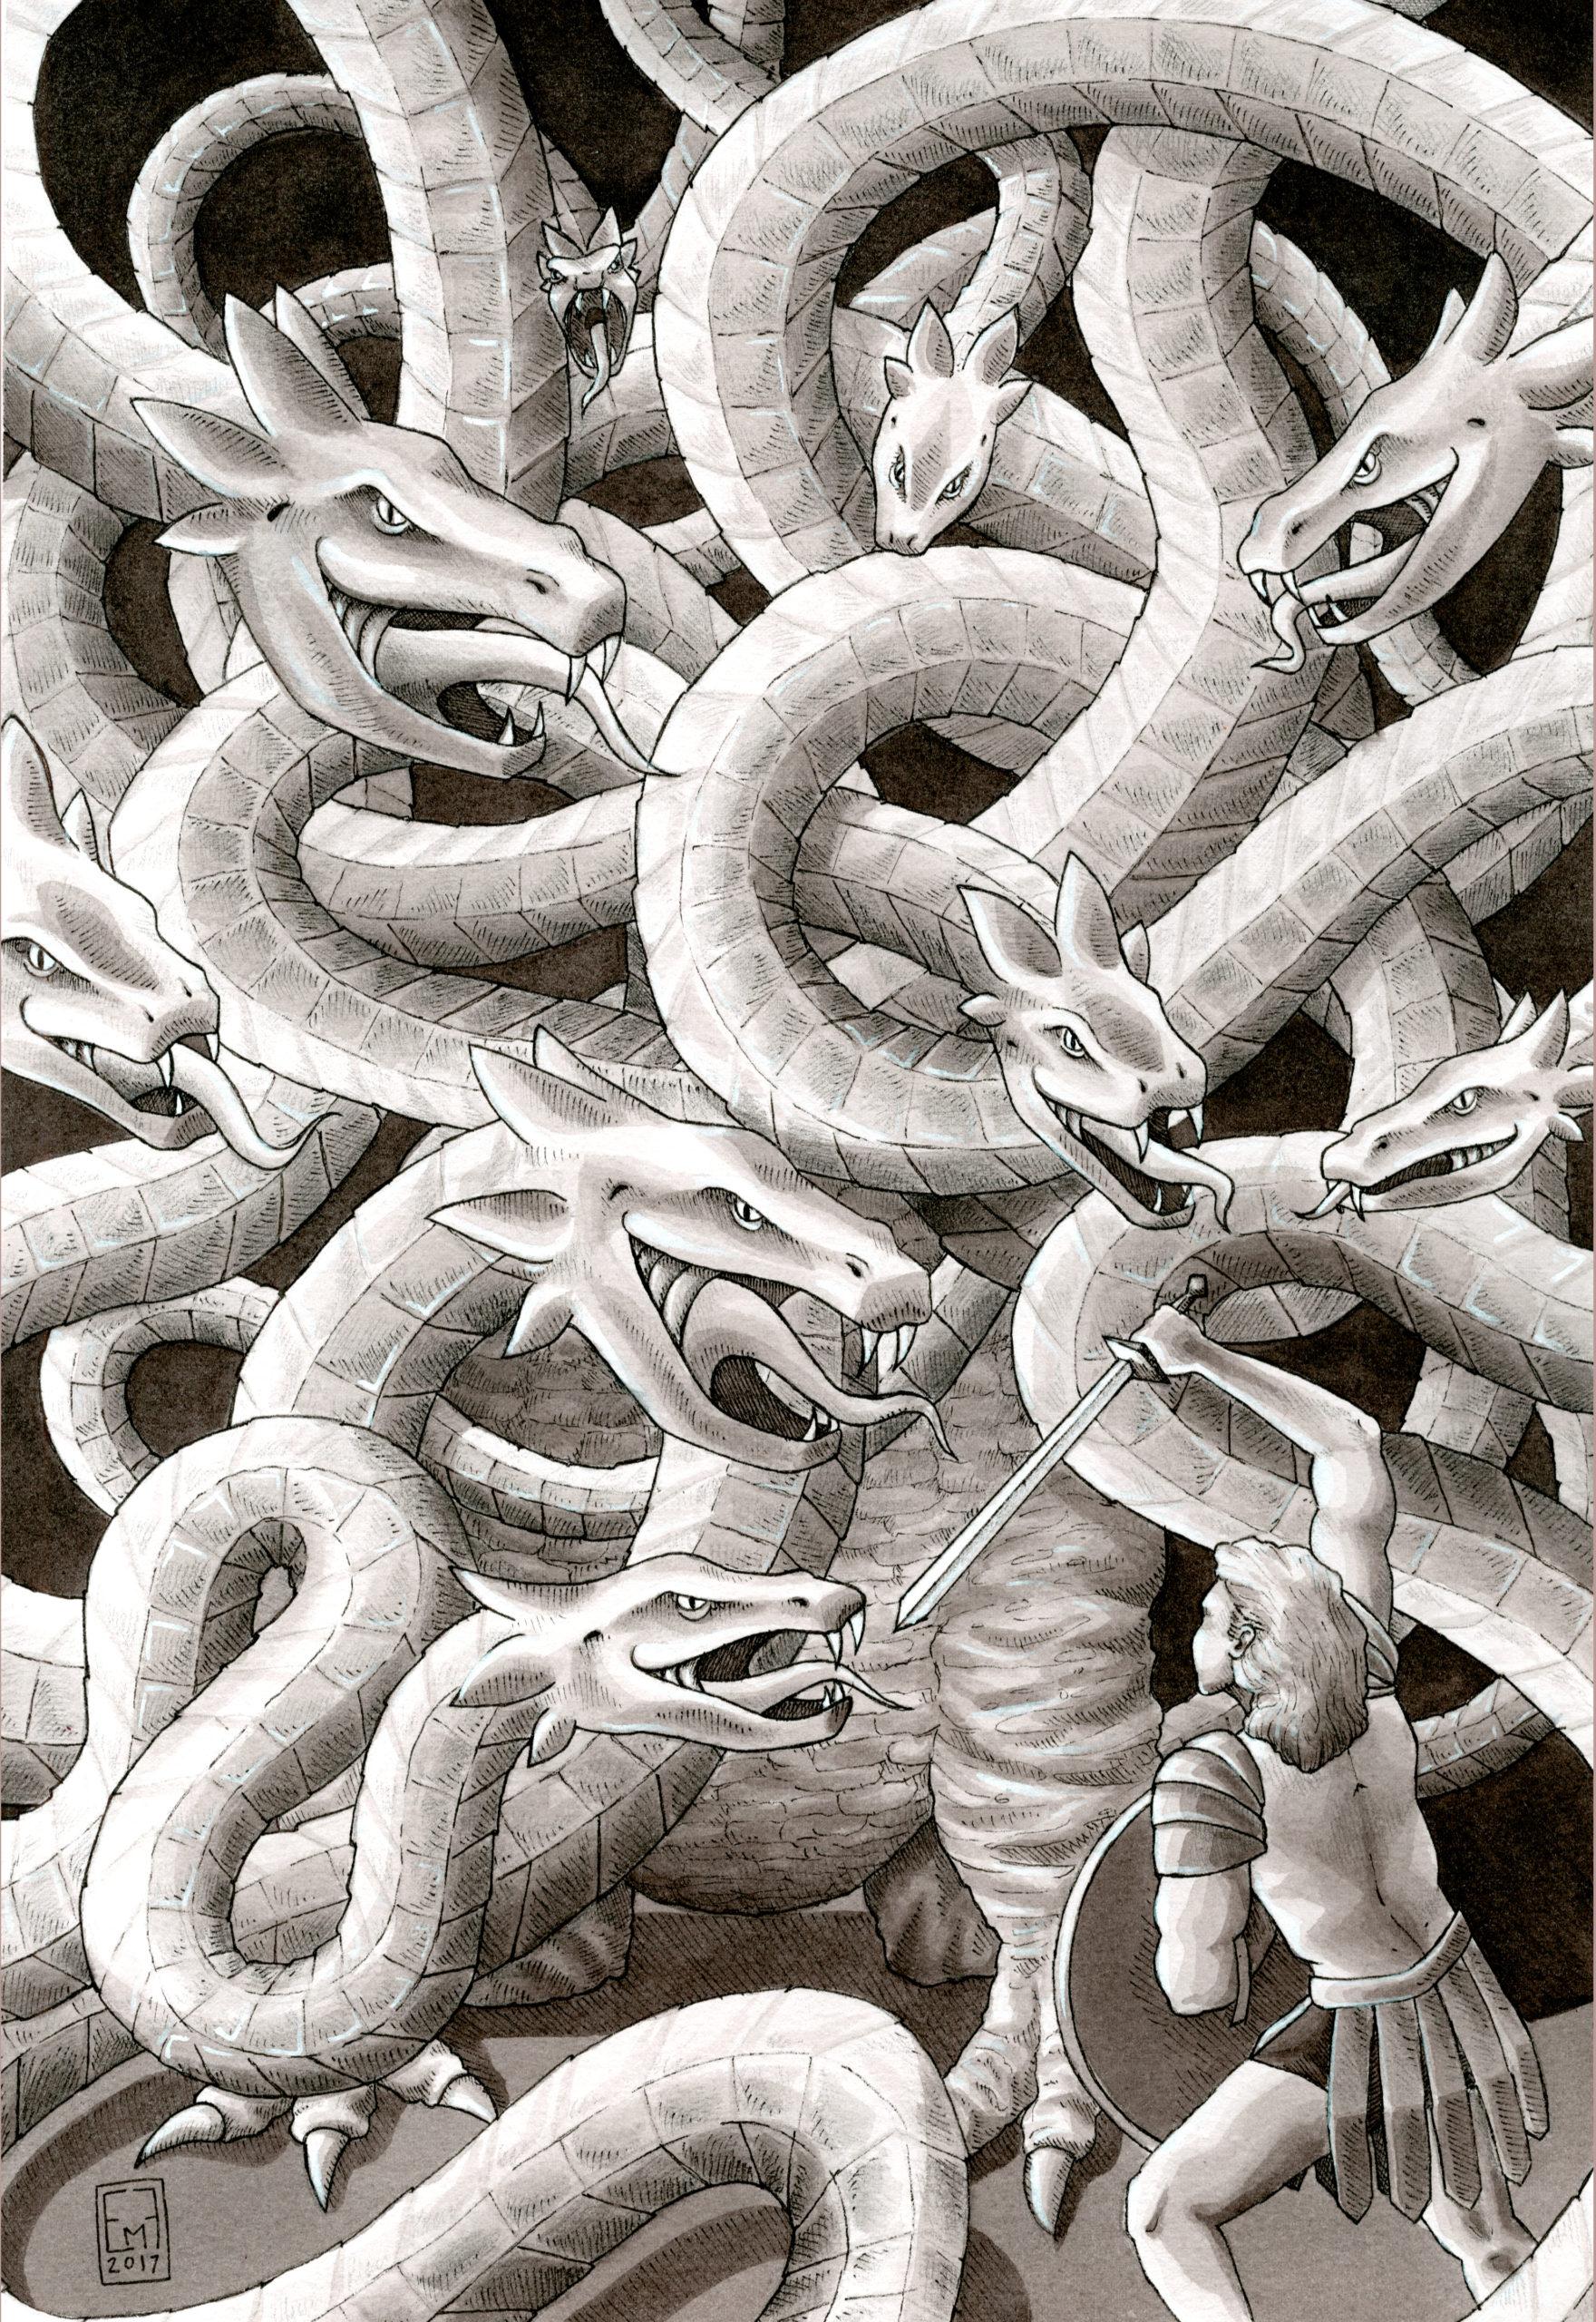 Hercules student artwork from MassArt, Fortier